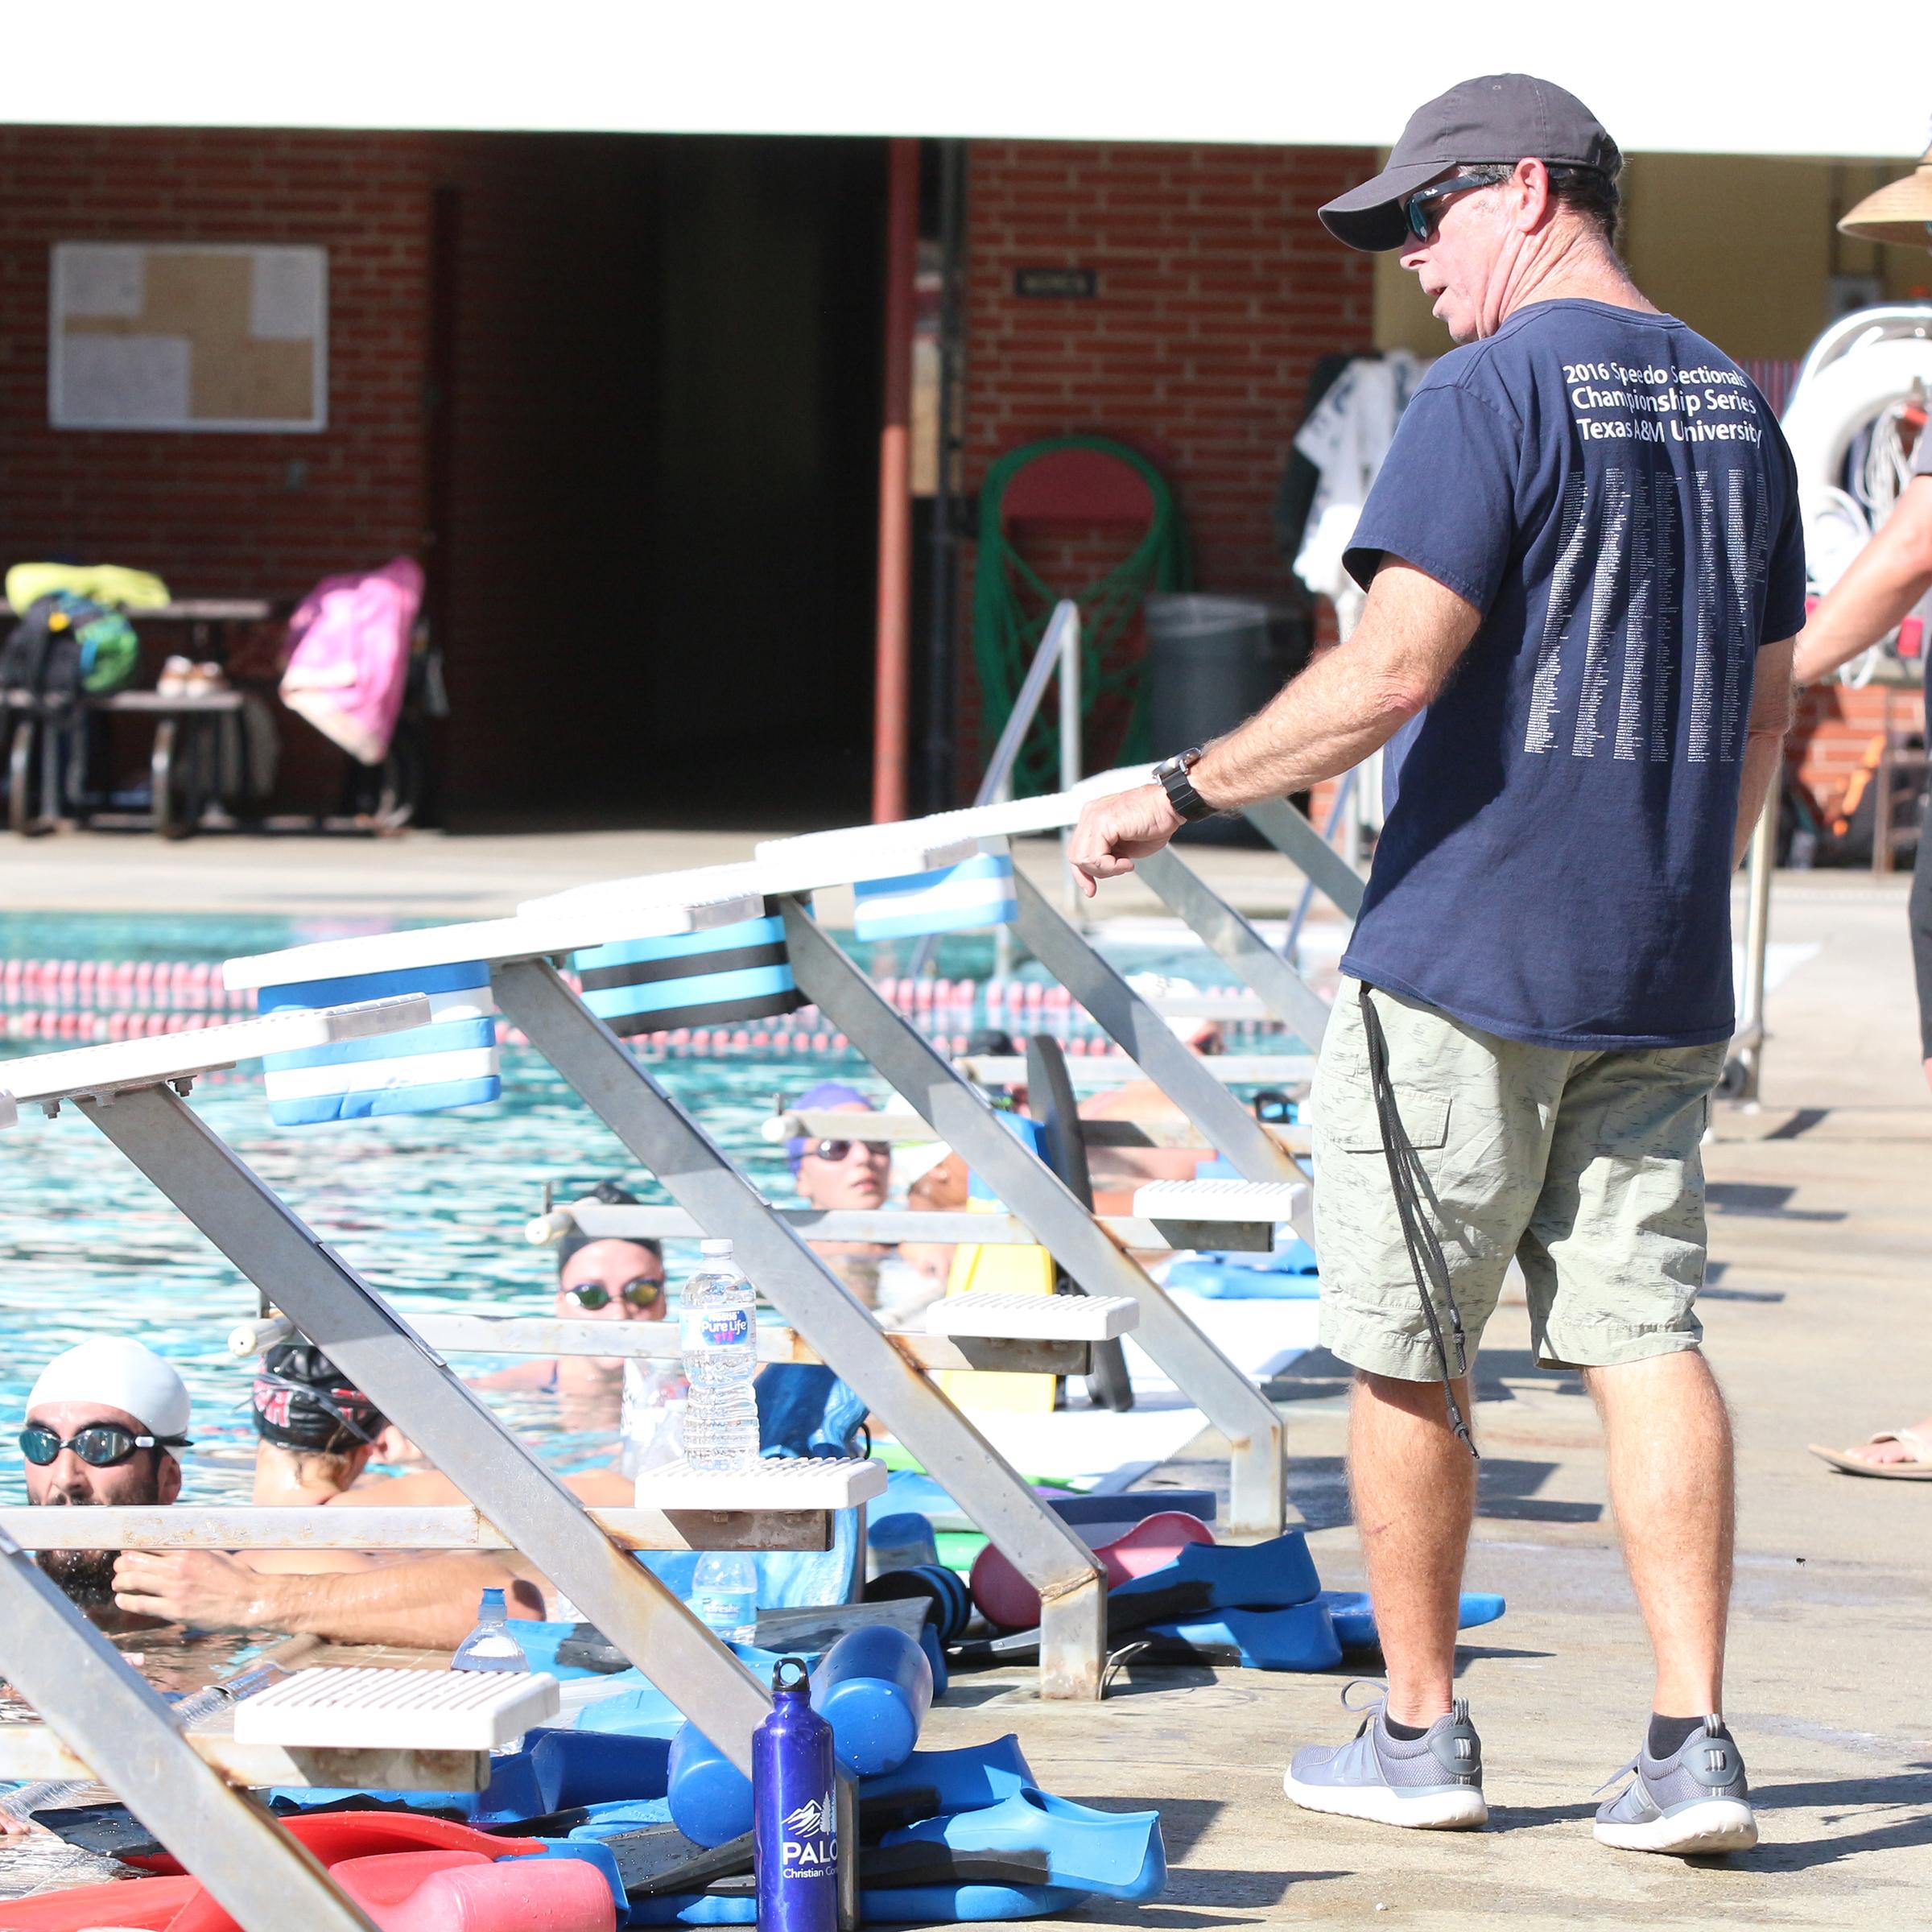 Palomar's swim teams meet for practice with coach Jem McAdams, Feb. 8. Taylor Hardey/The Telescope